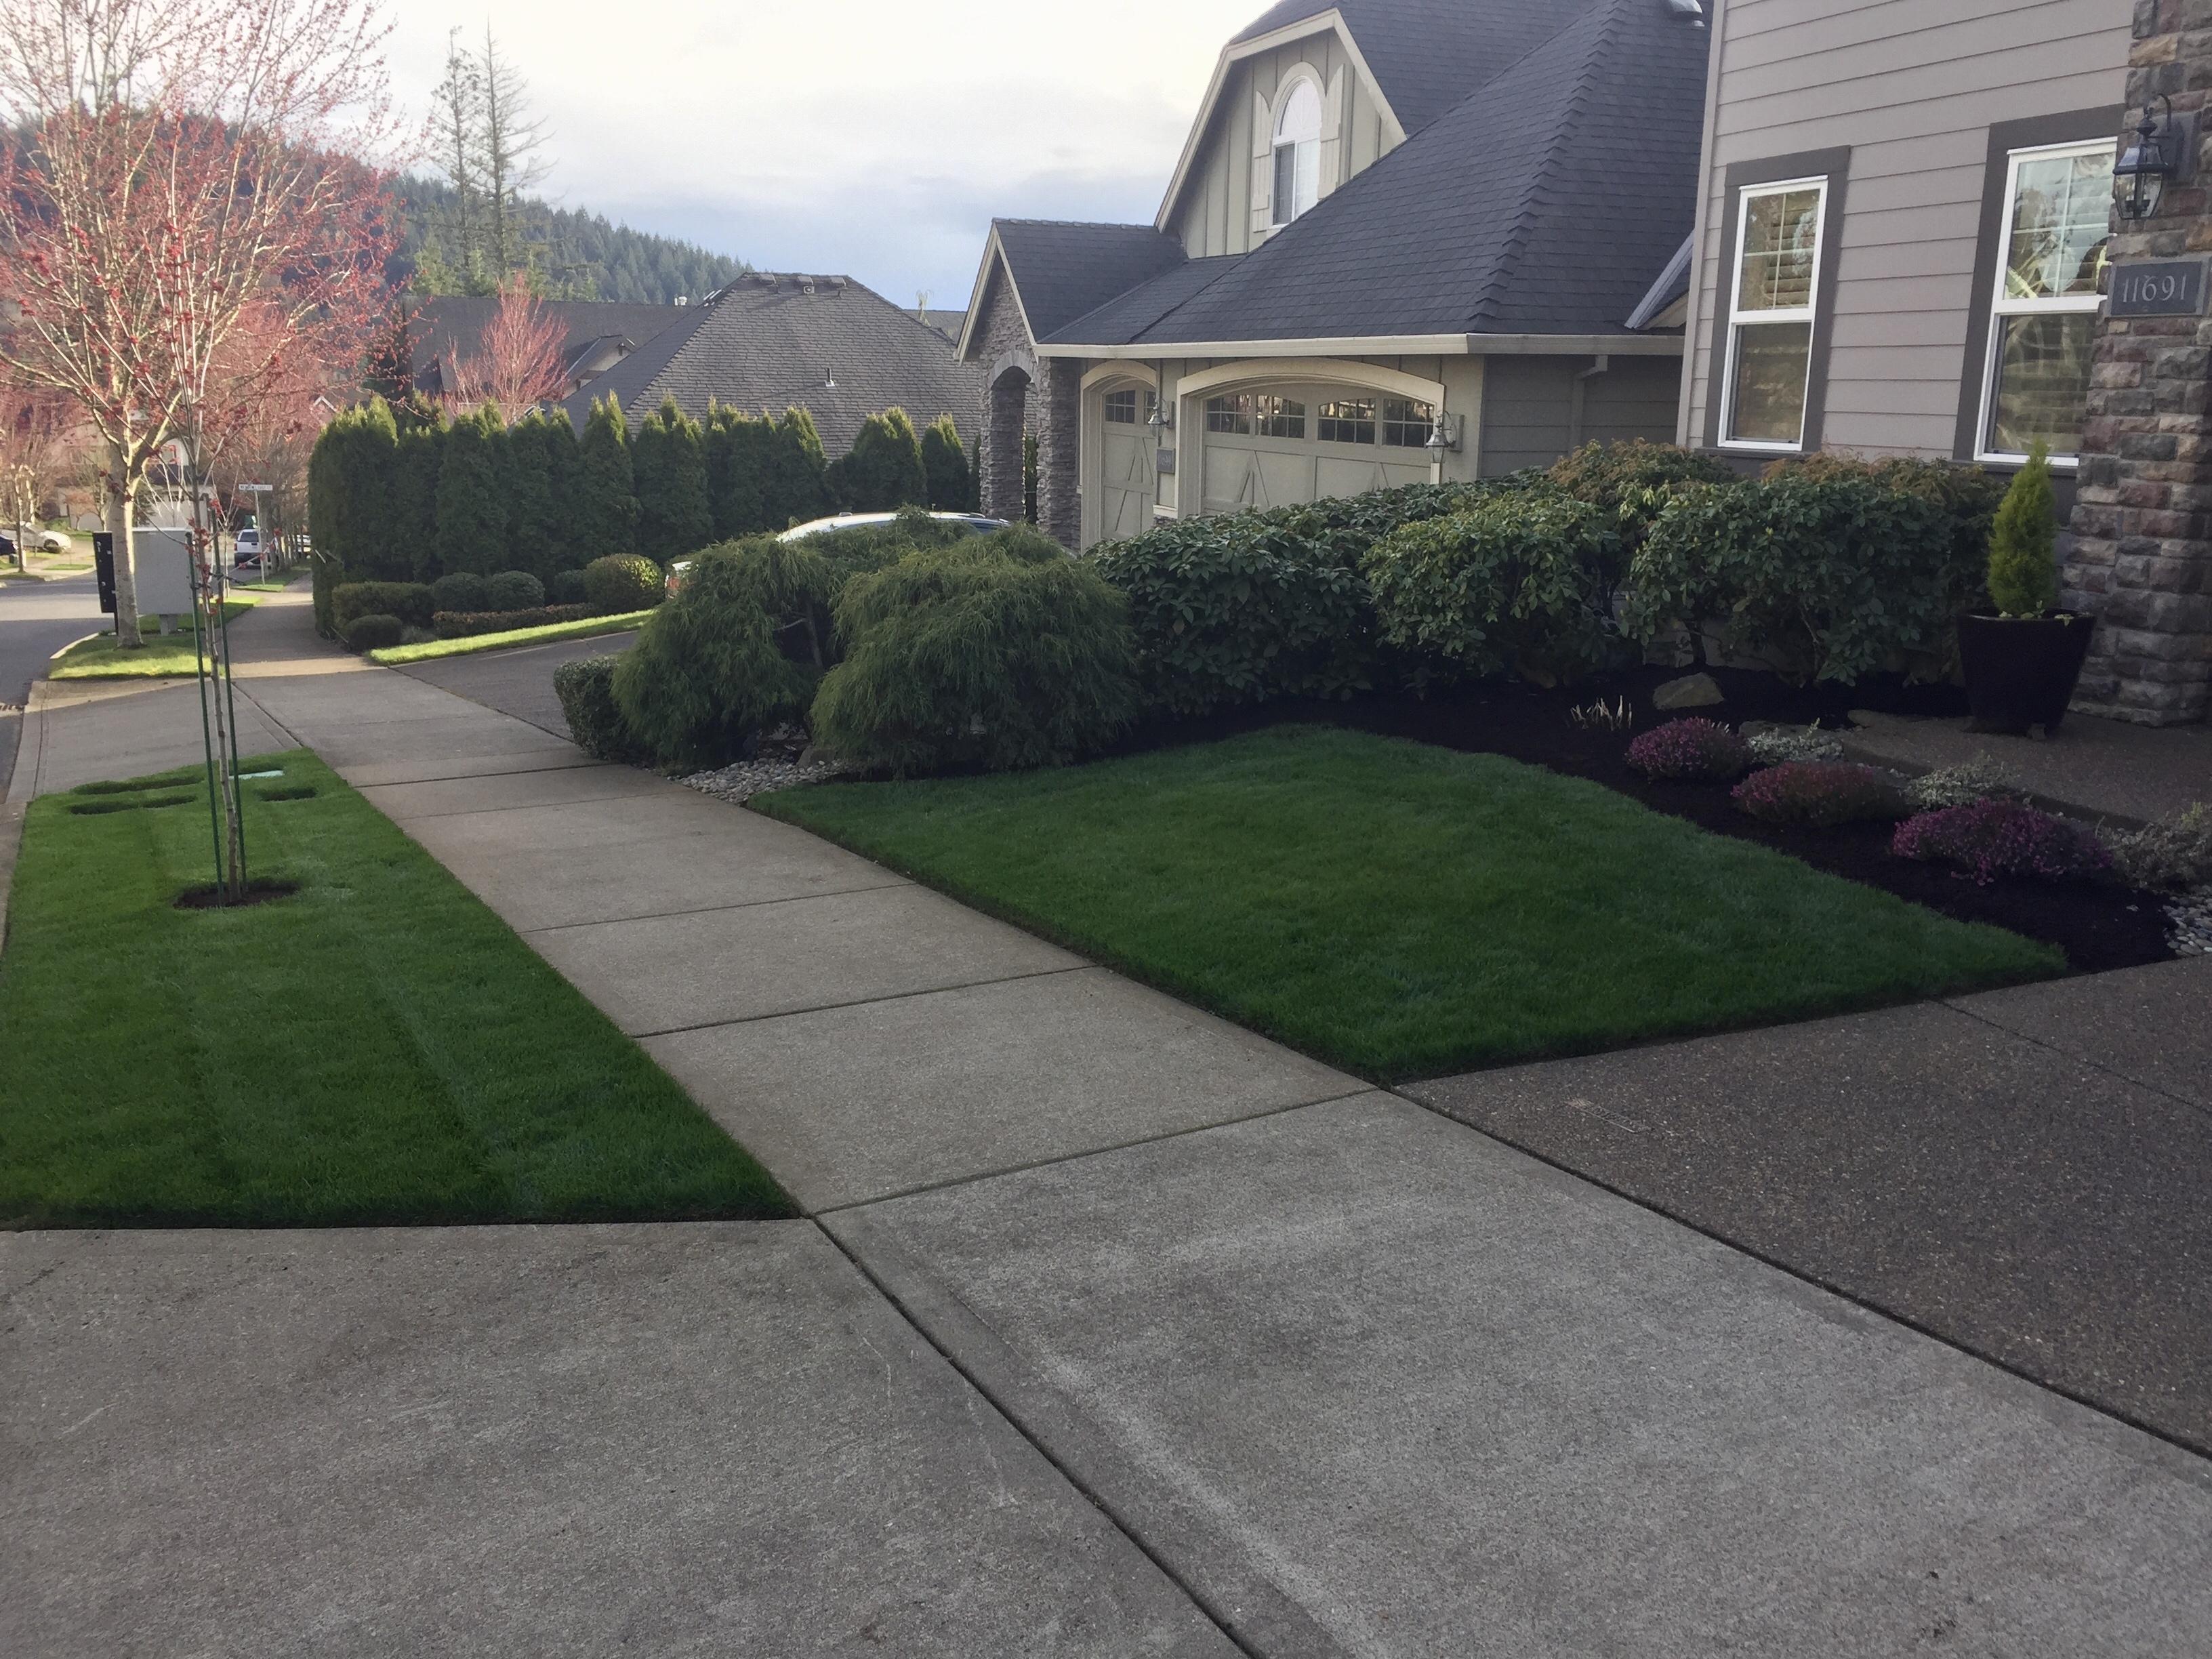 Freshly landscaped lawn